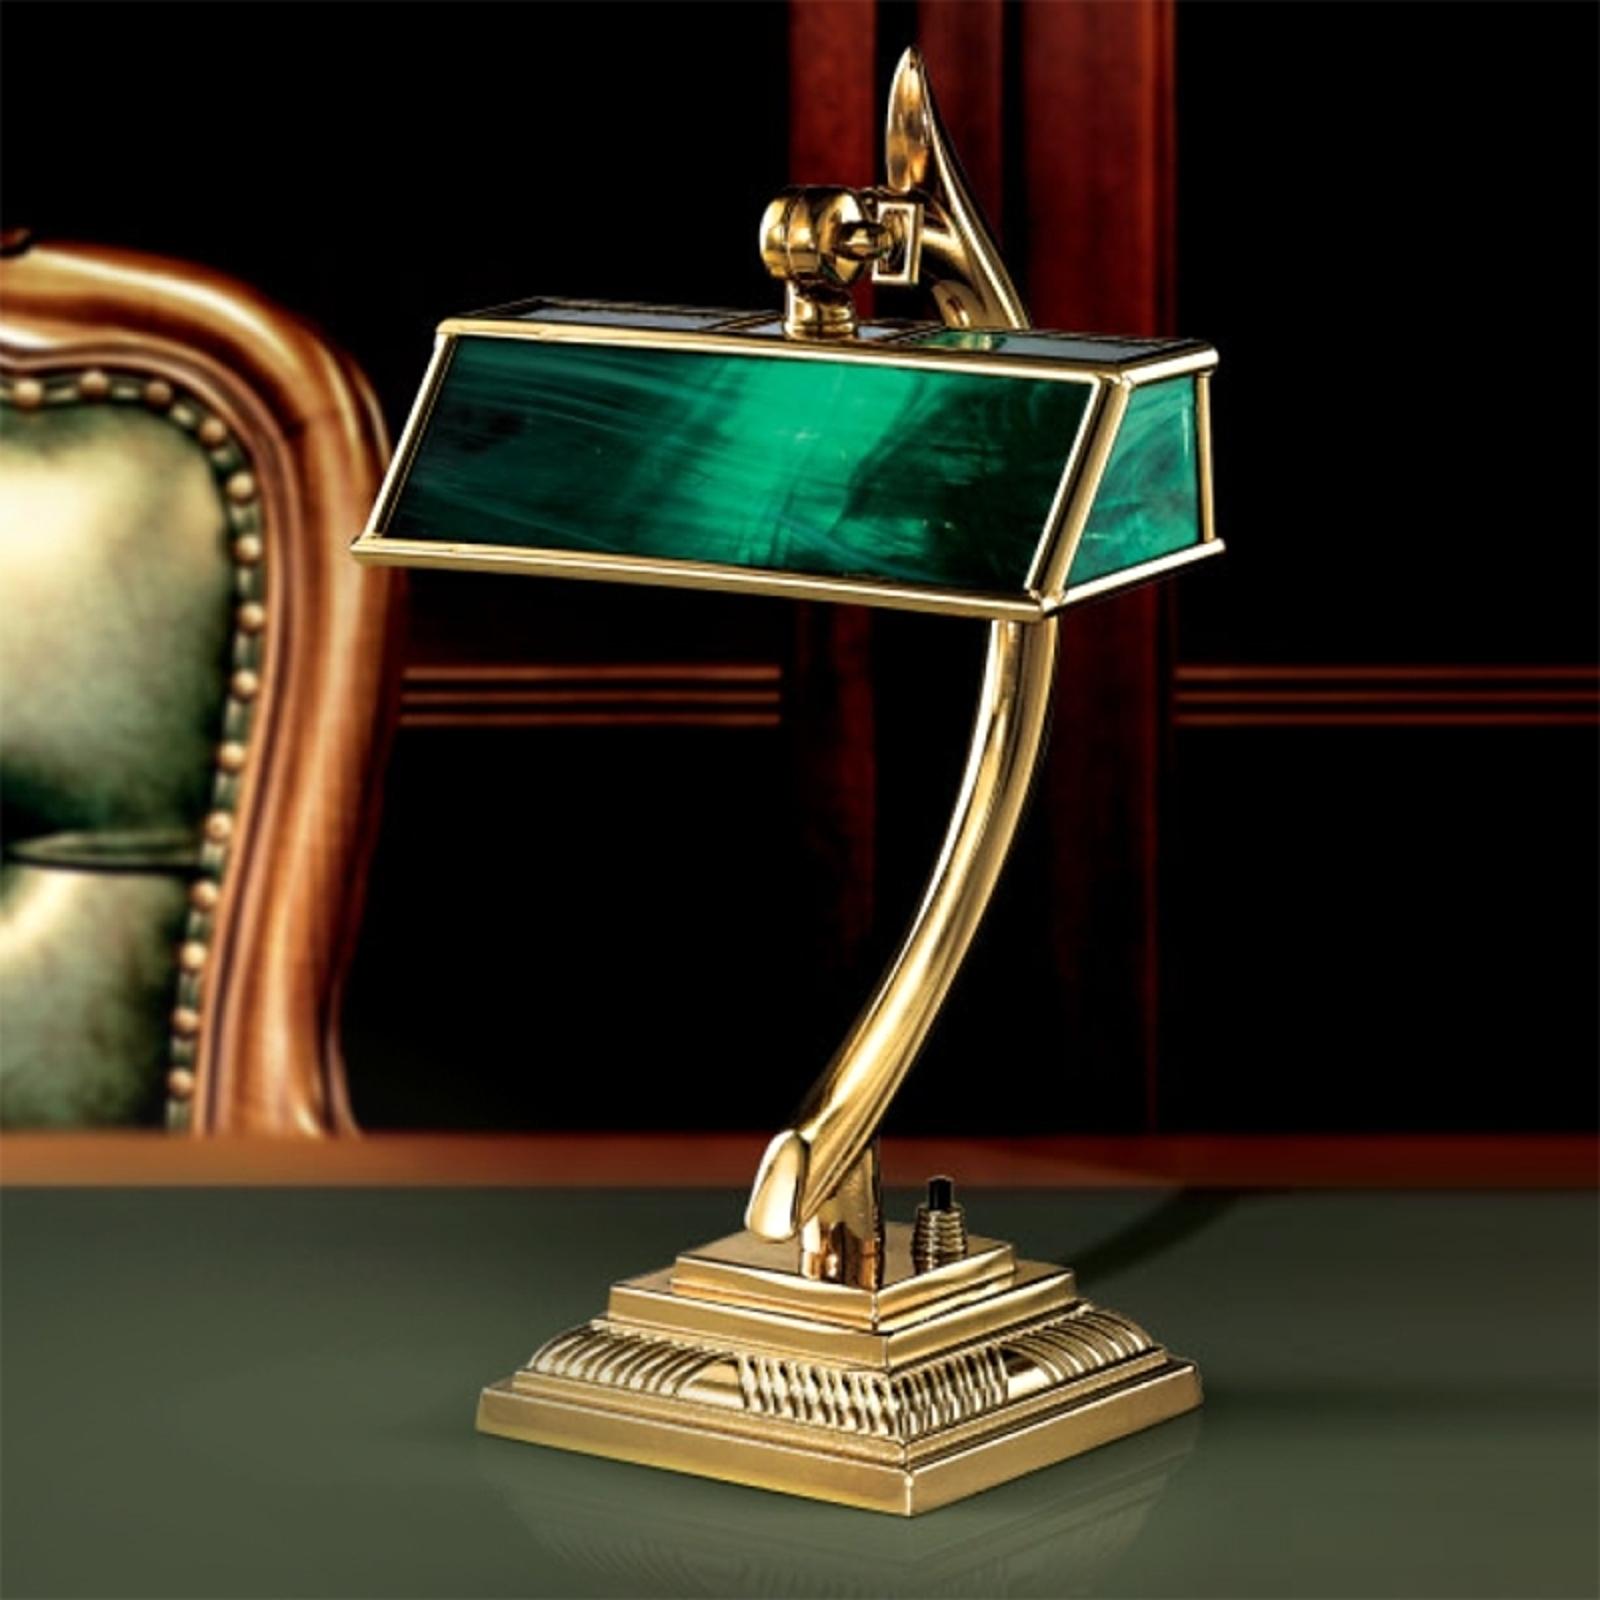 Reprezentatívna stolná lampa Antiko_2008007_1